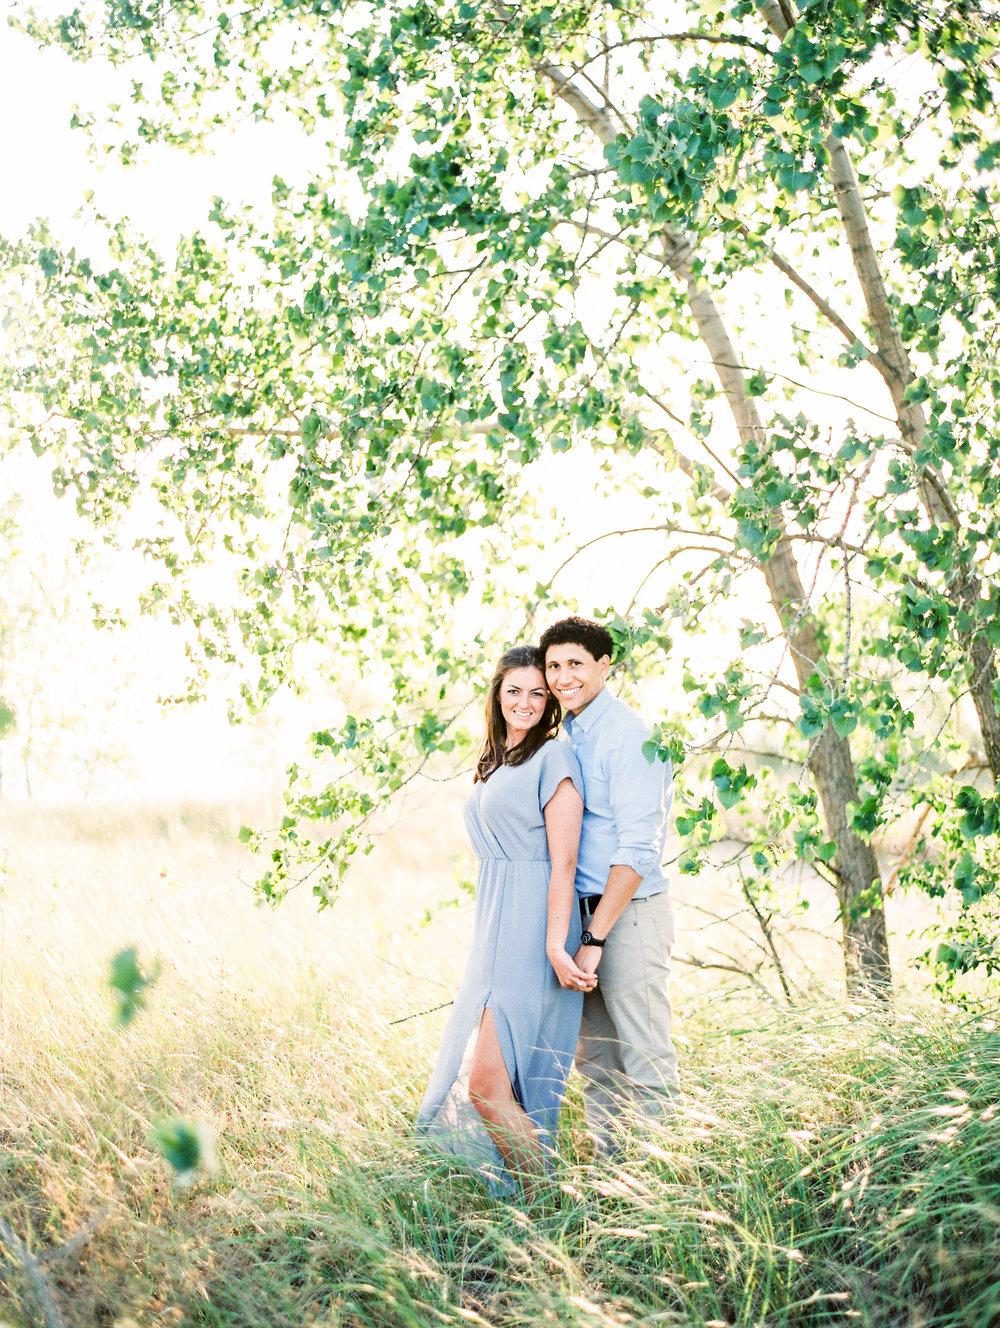 Lucie+Anthony+Engaged-28.jpg